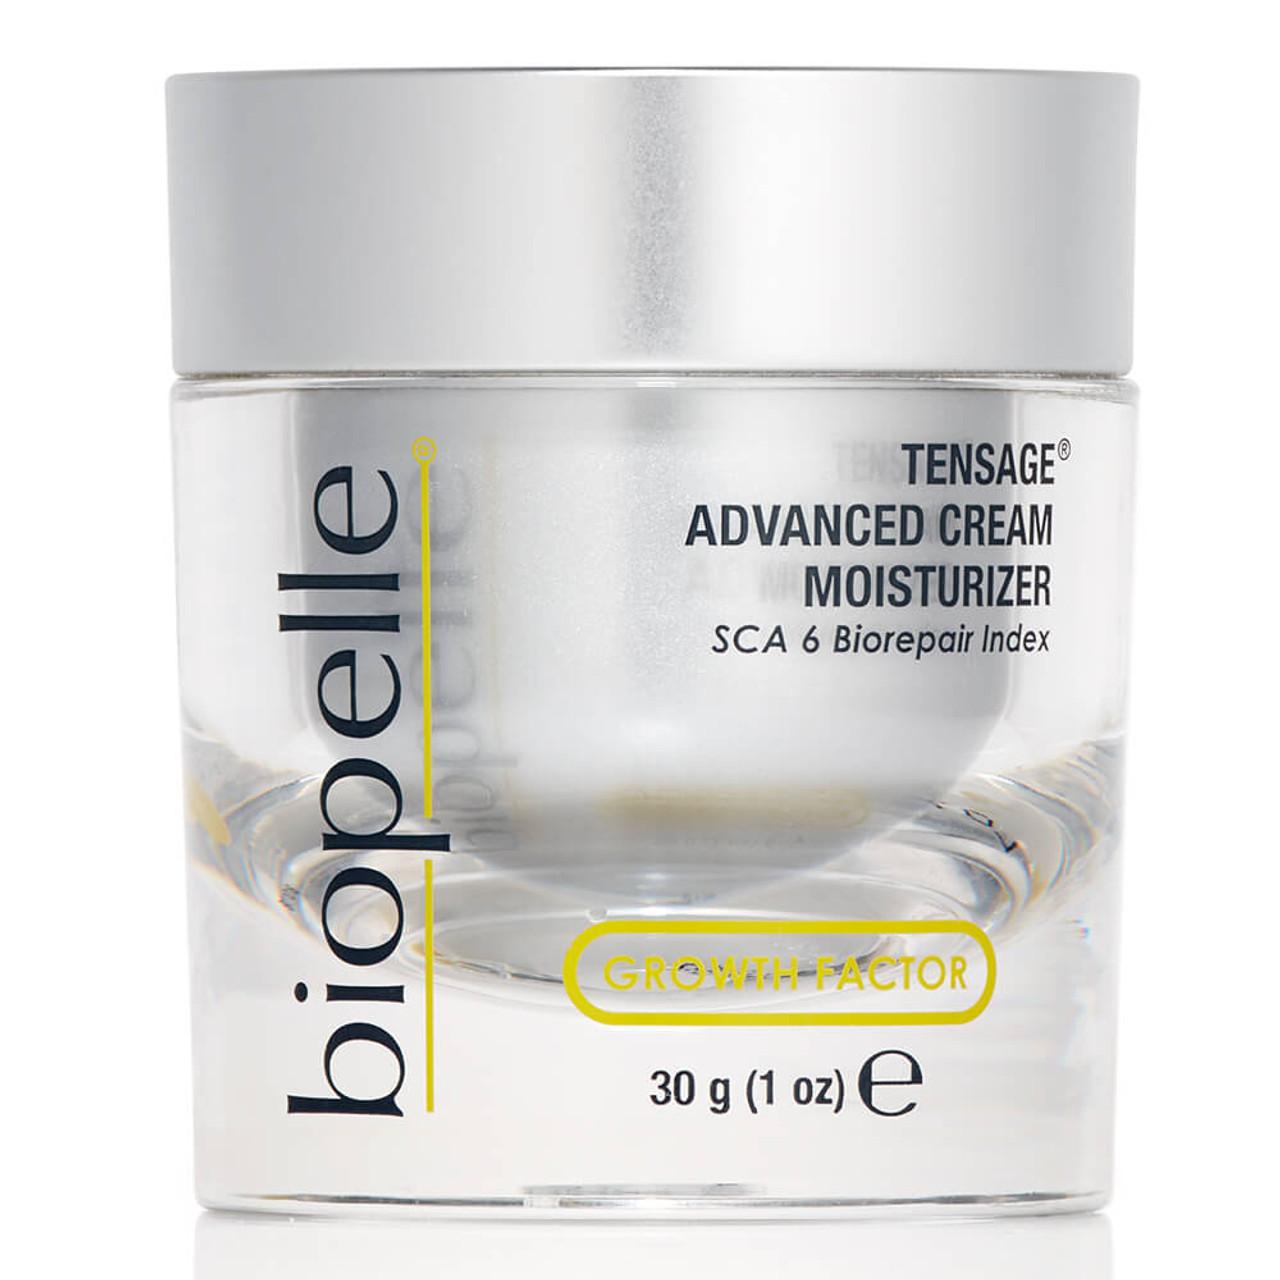 Biopelle Tensage Advanced Cream Moisturizer BeautifiedYou.com